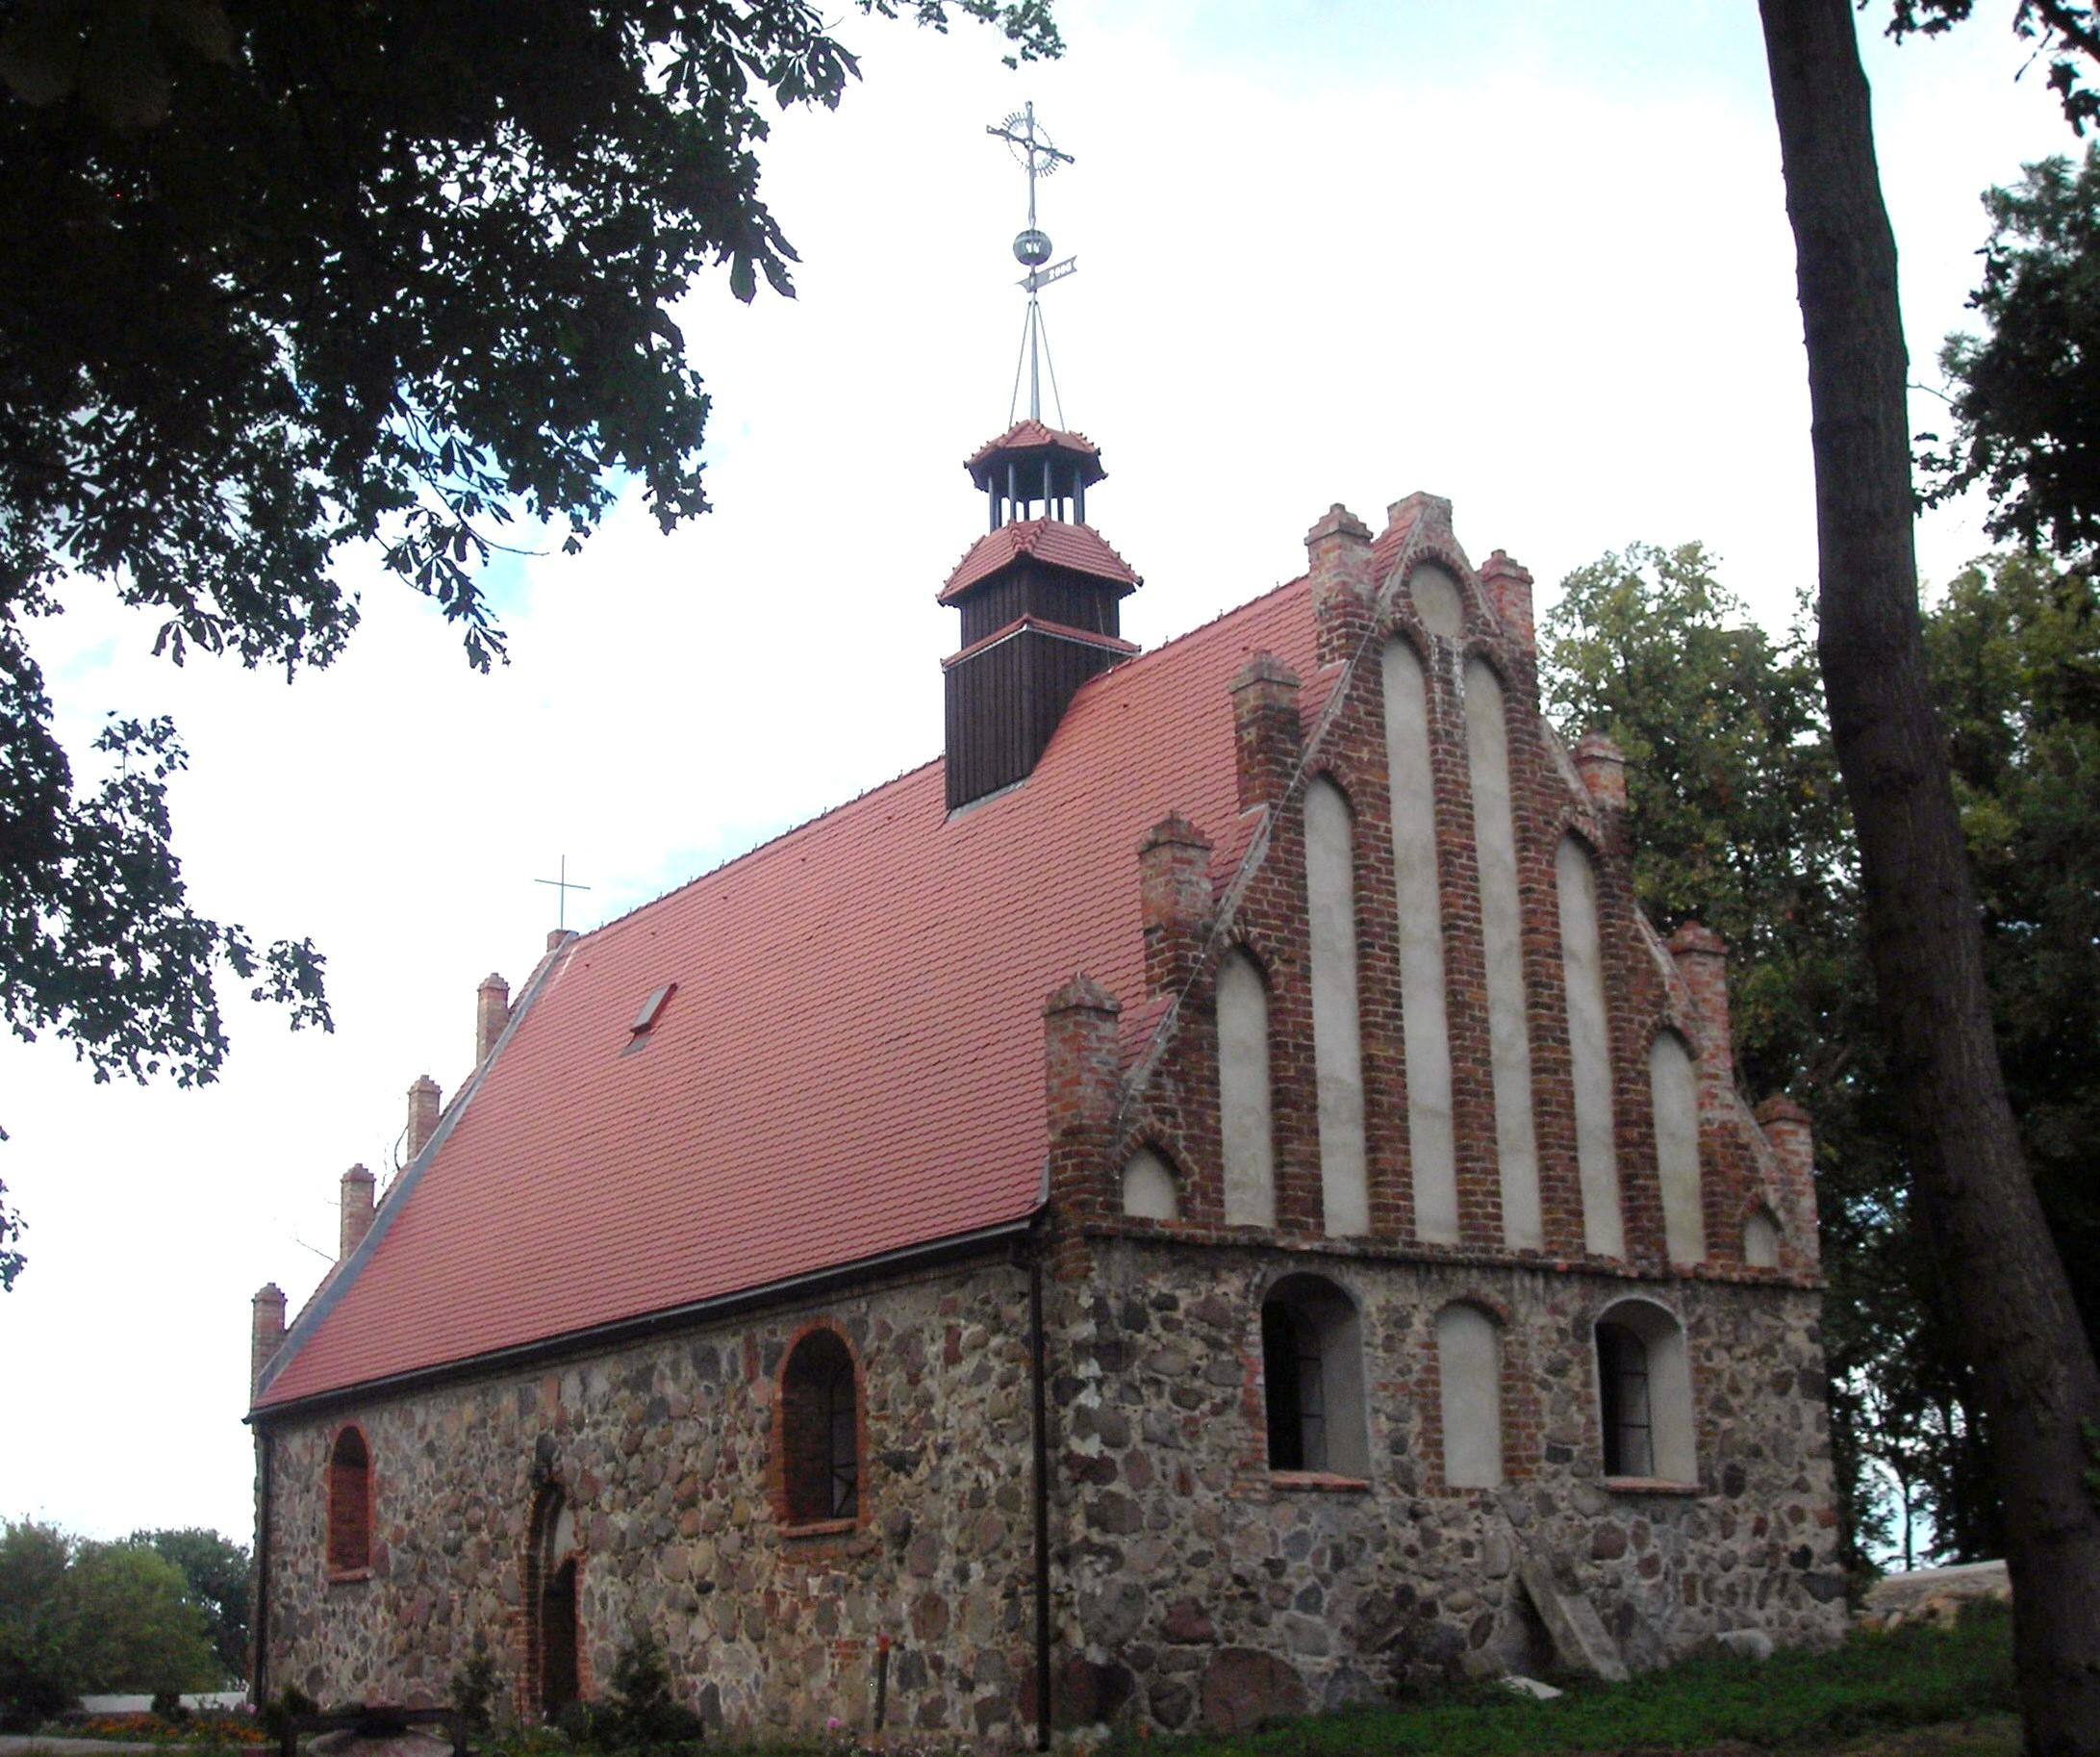 Loist Kreis Pyritz, Pommern